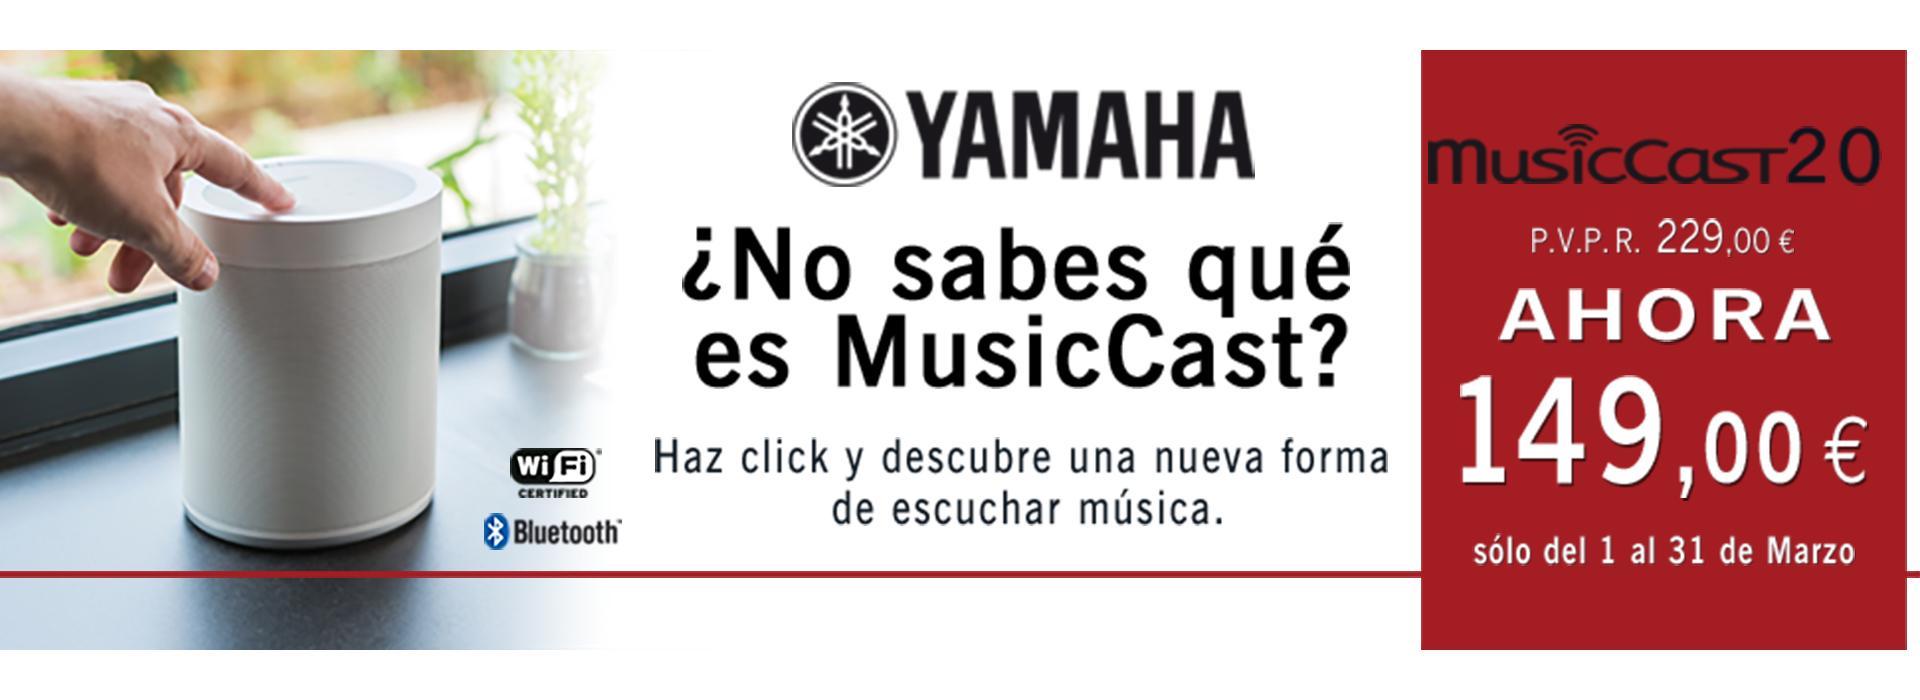 Banner-YAMAHA-MusicCast-domotica-1920x600